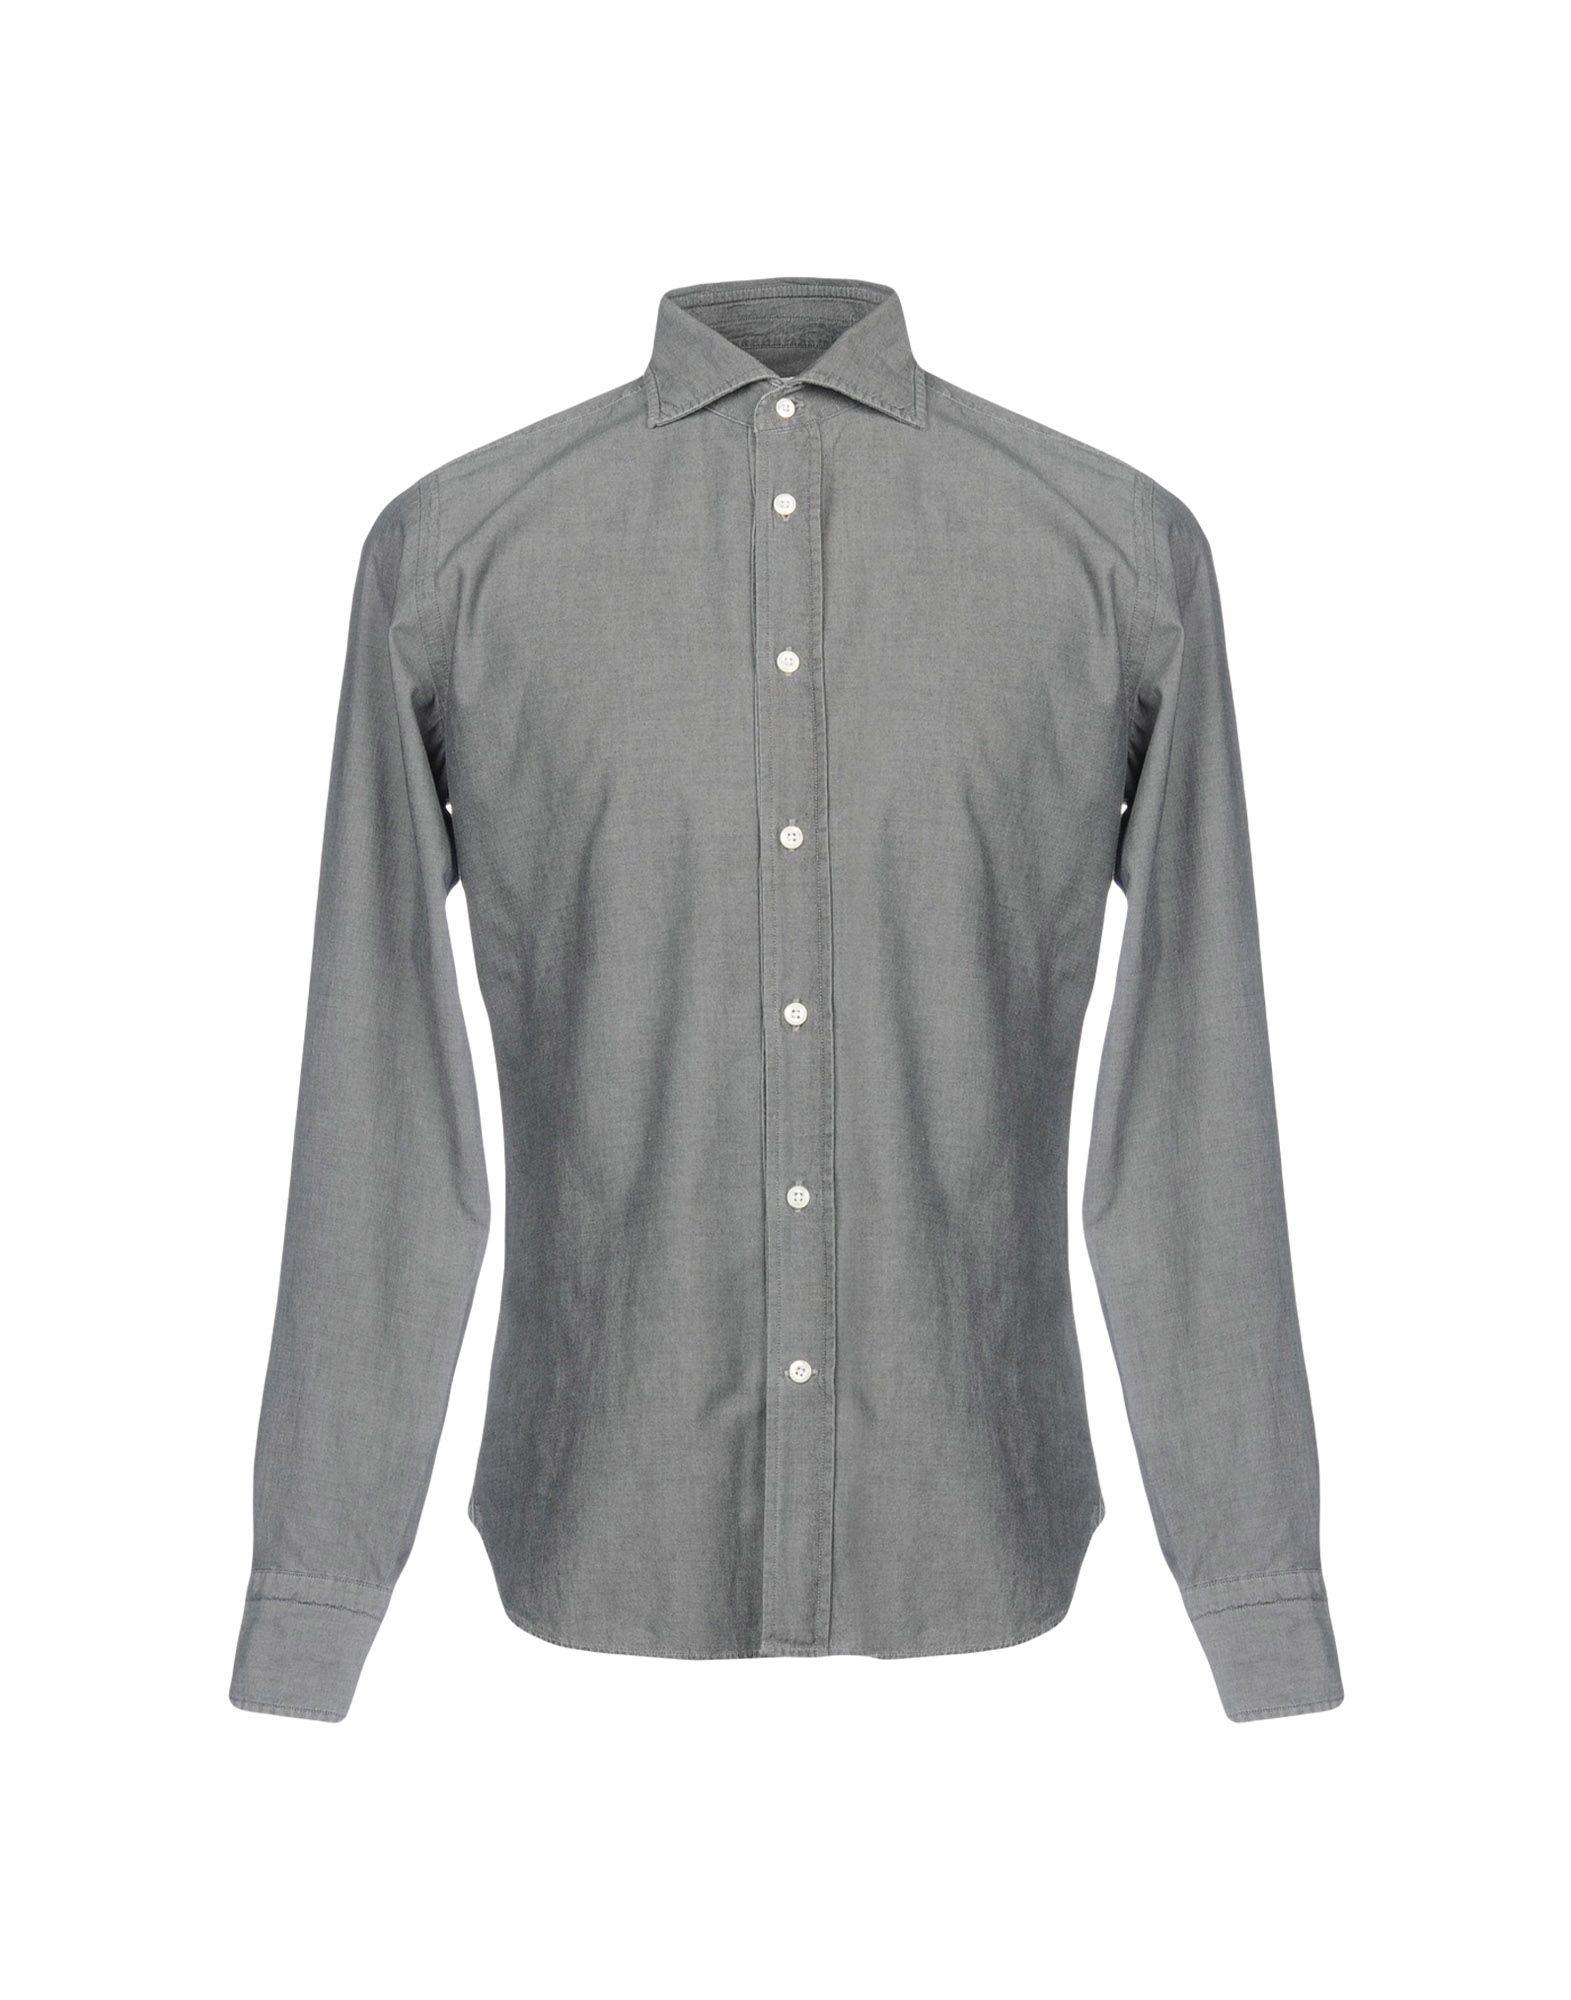 BOLZONELLA 1934 Shirts in Grey